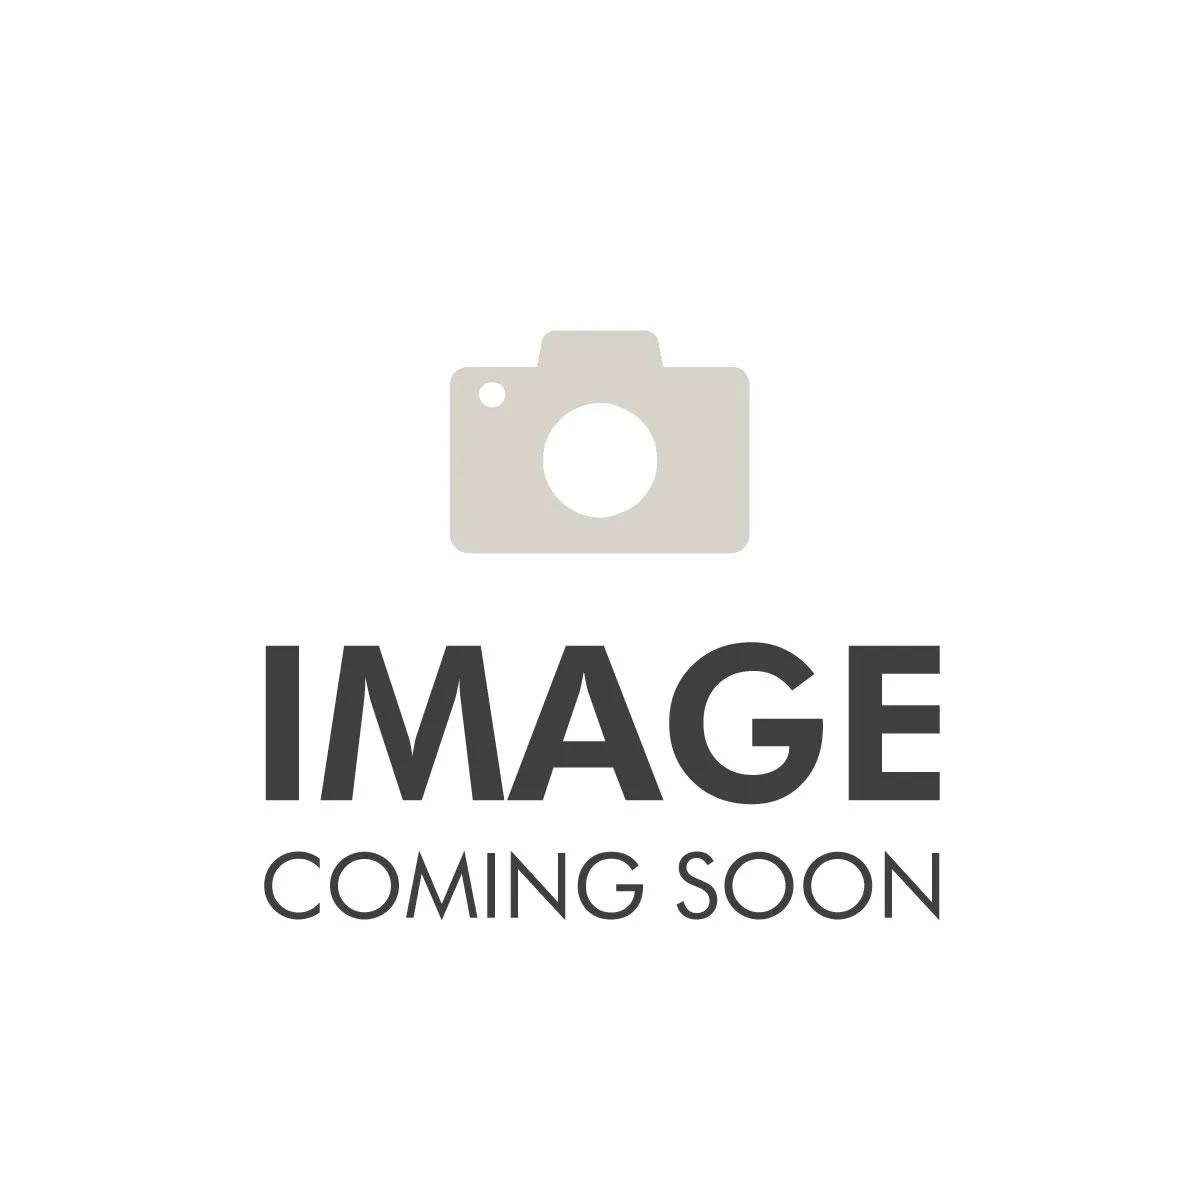 Mesh Header Roll Bar Top; 97-06 Jeep Wrangler TJ